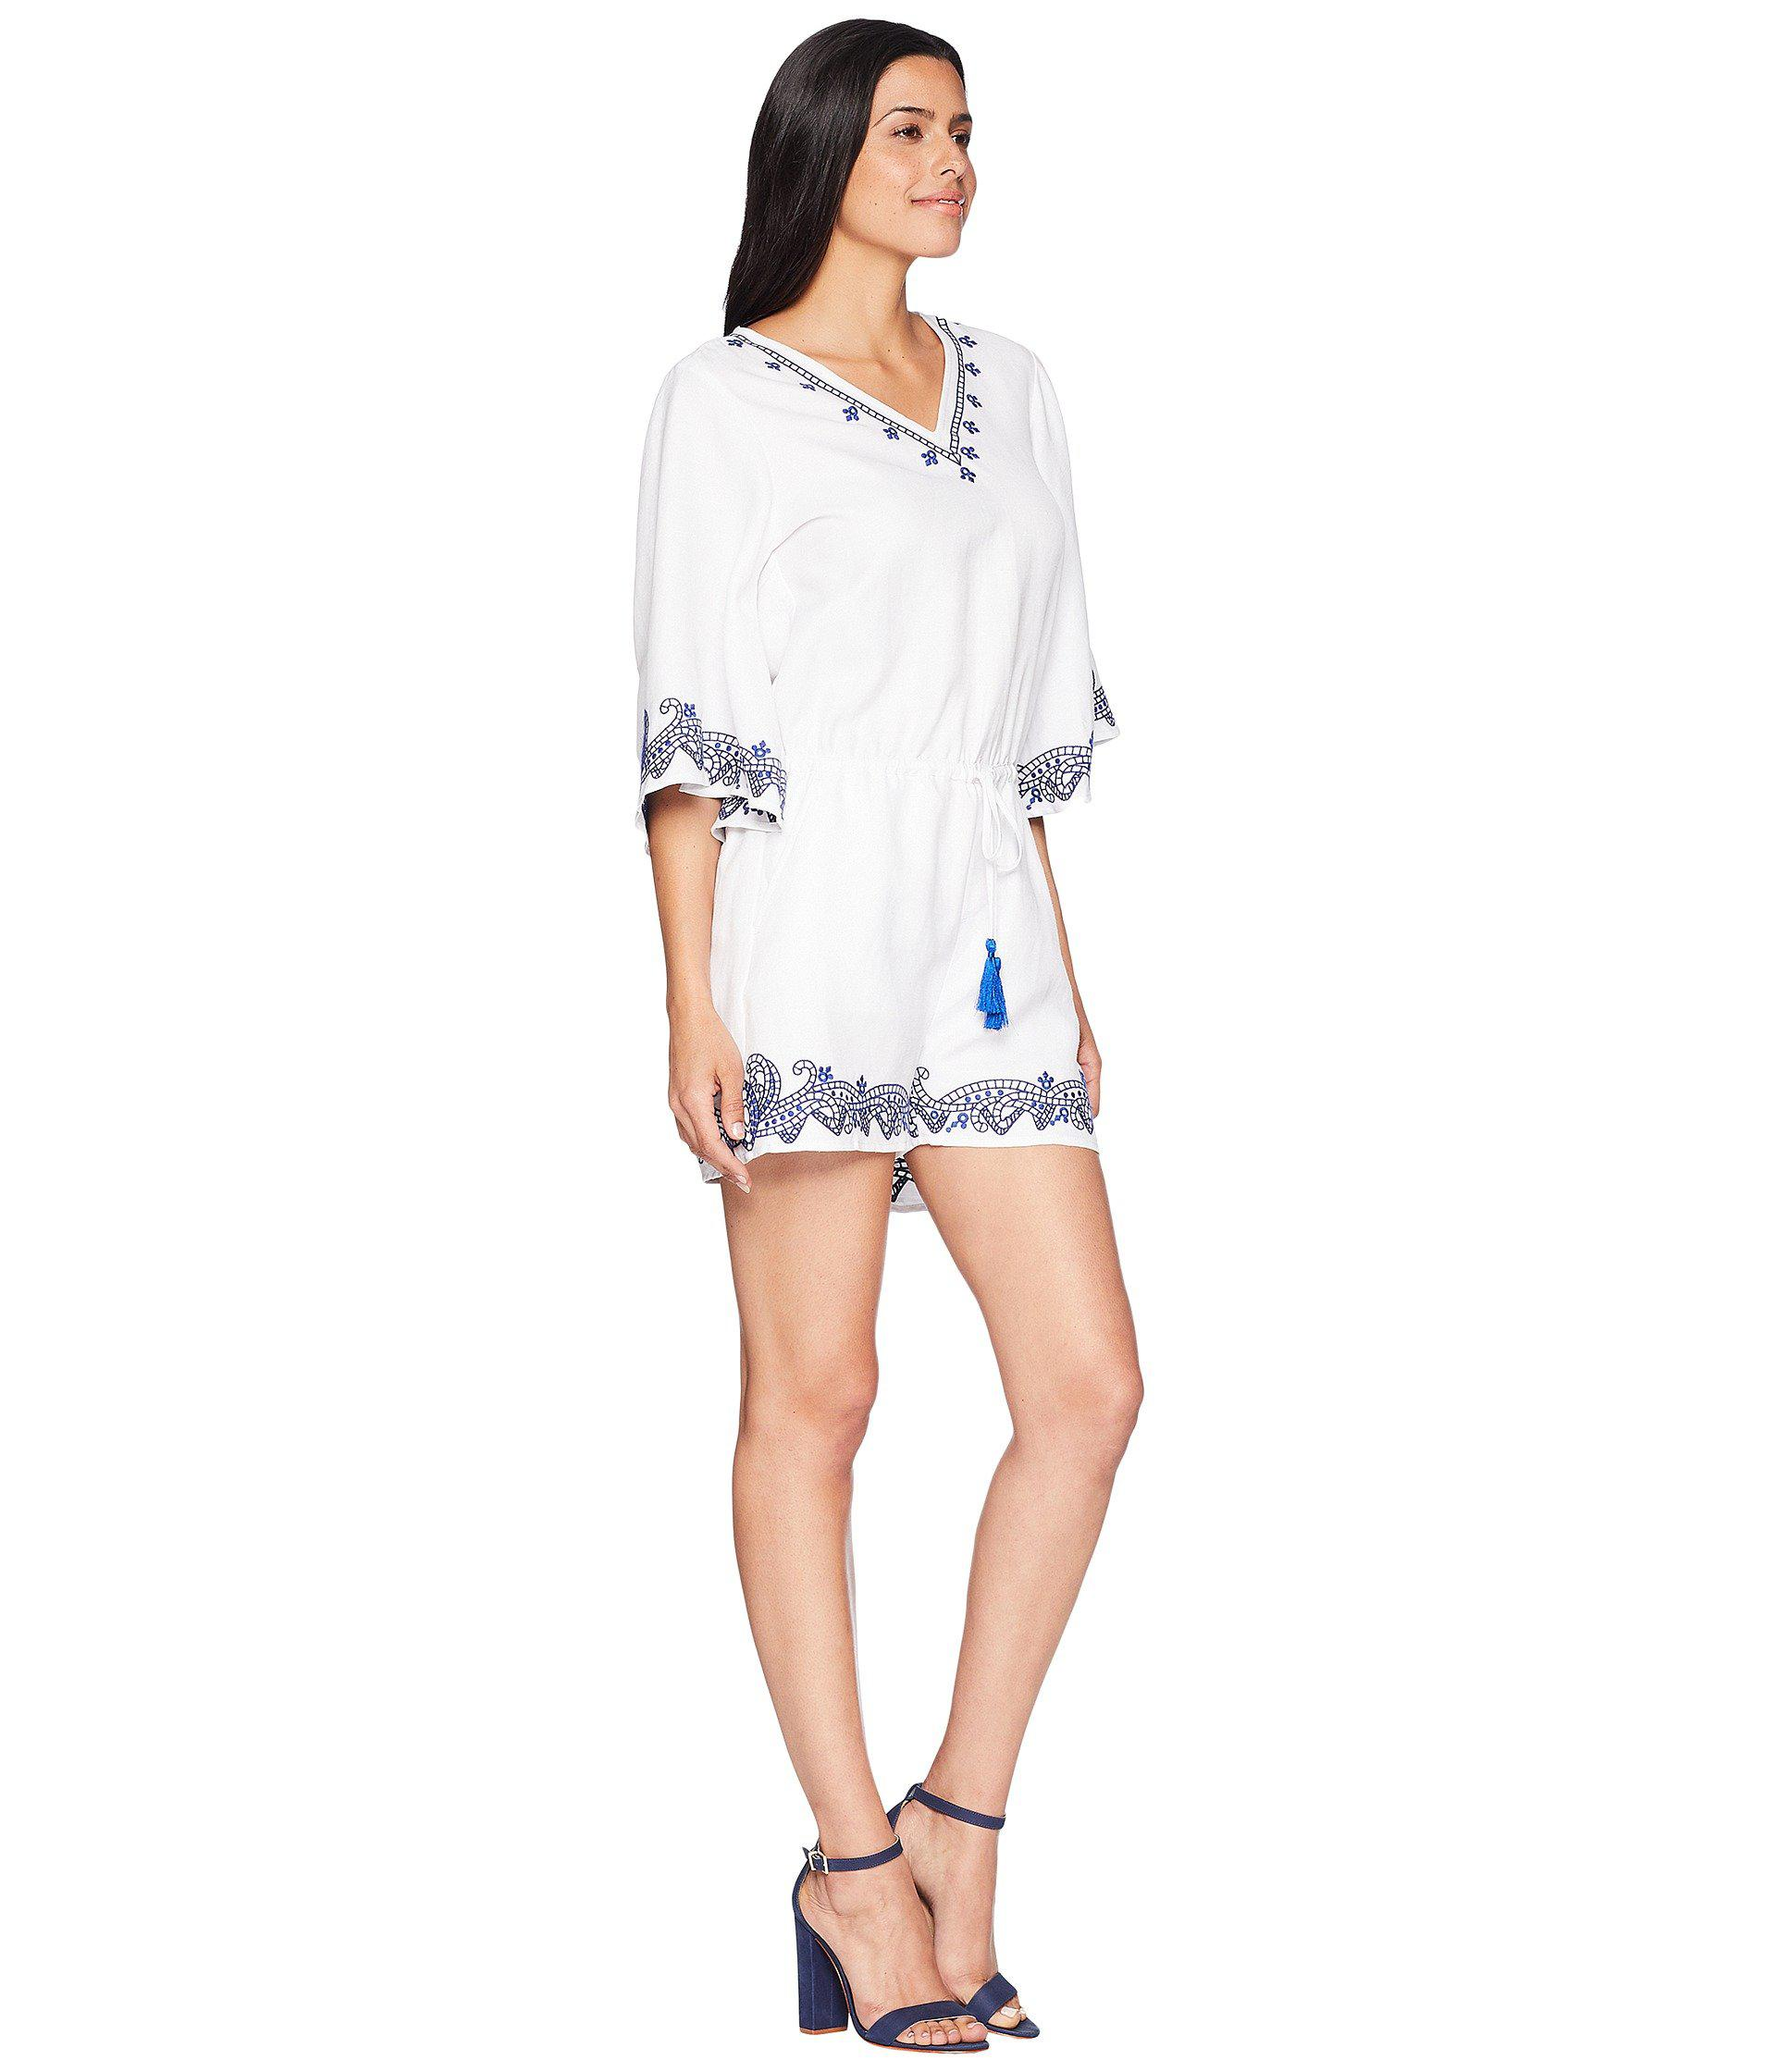 3c1f94b041ee Lauren by Ralph Lauren - White Embroidered Linen Romper - Lyst. View  fullscreen